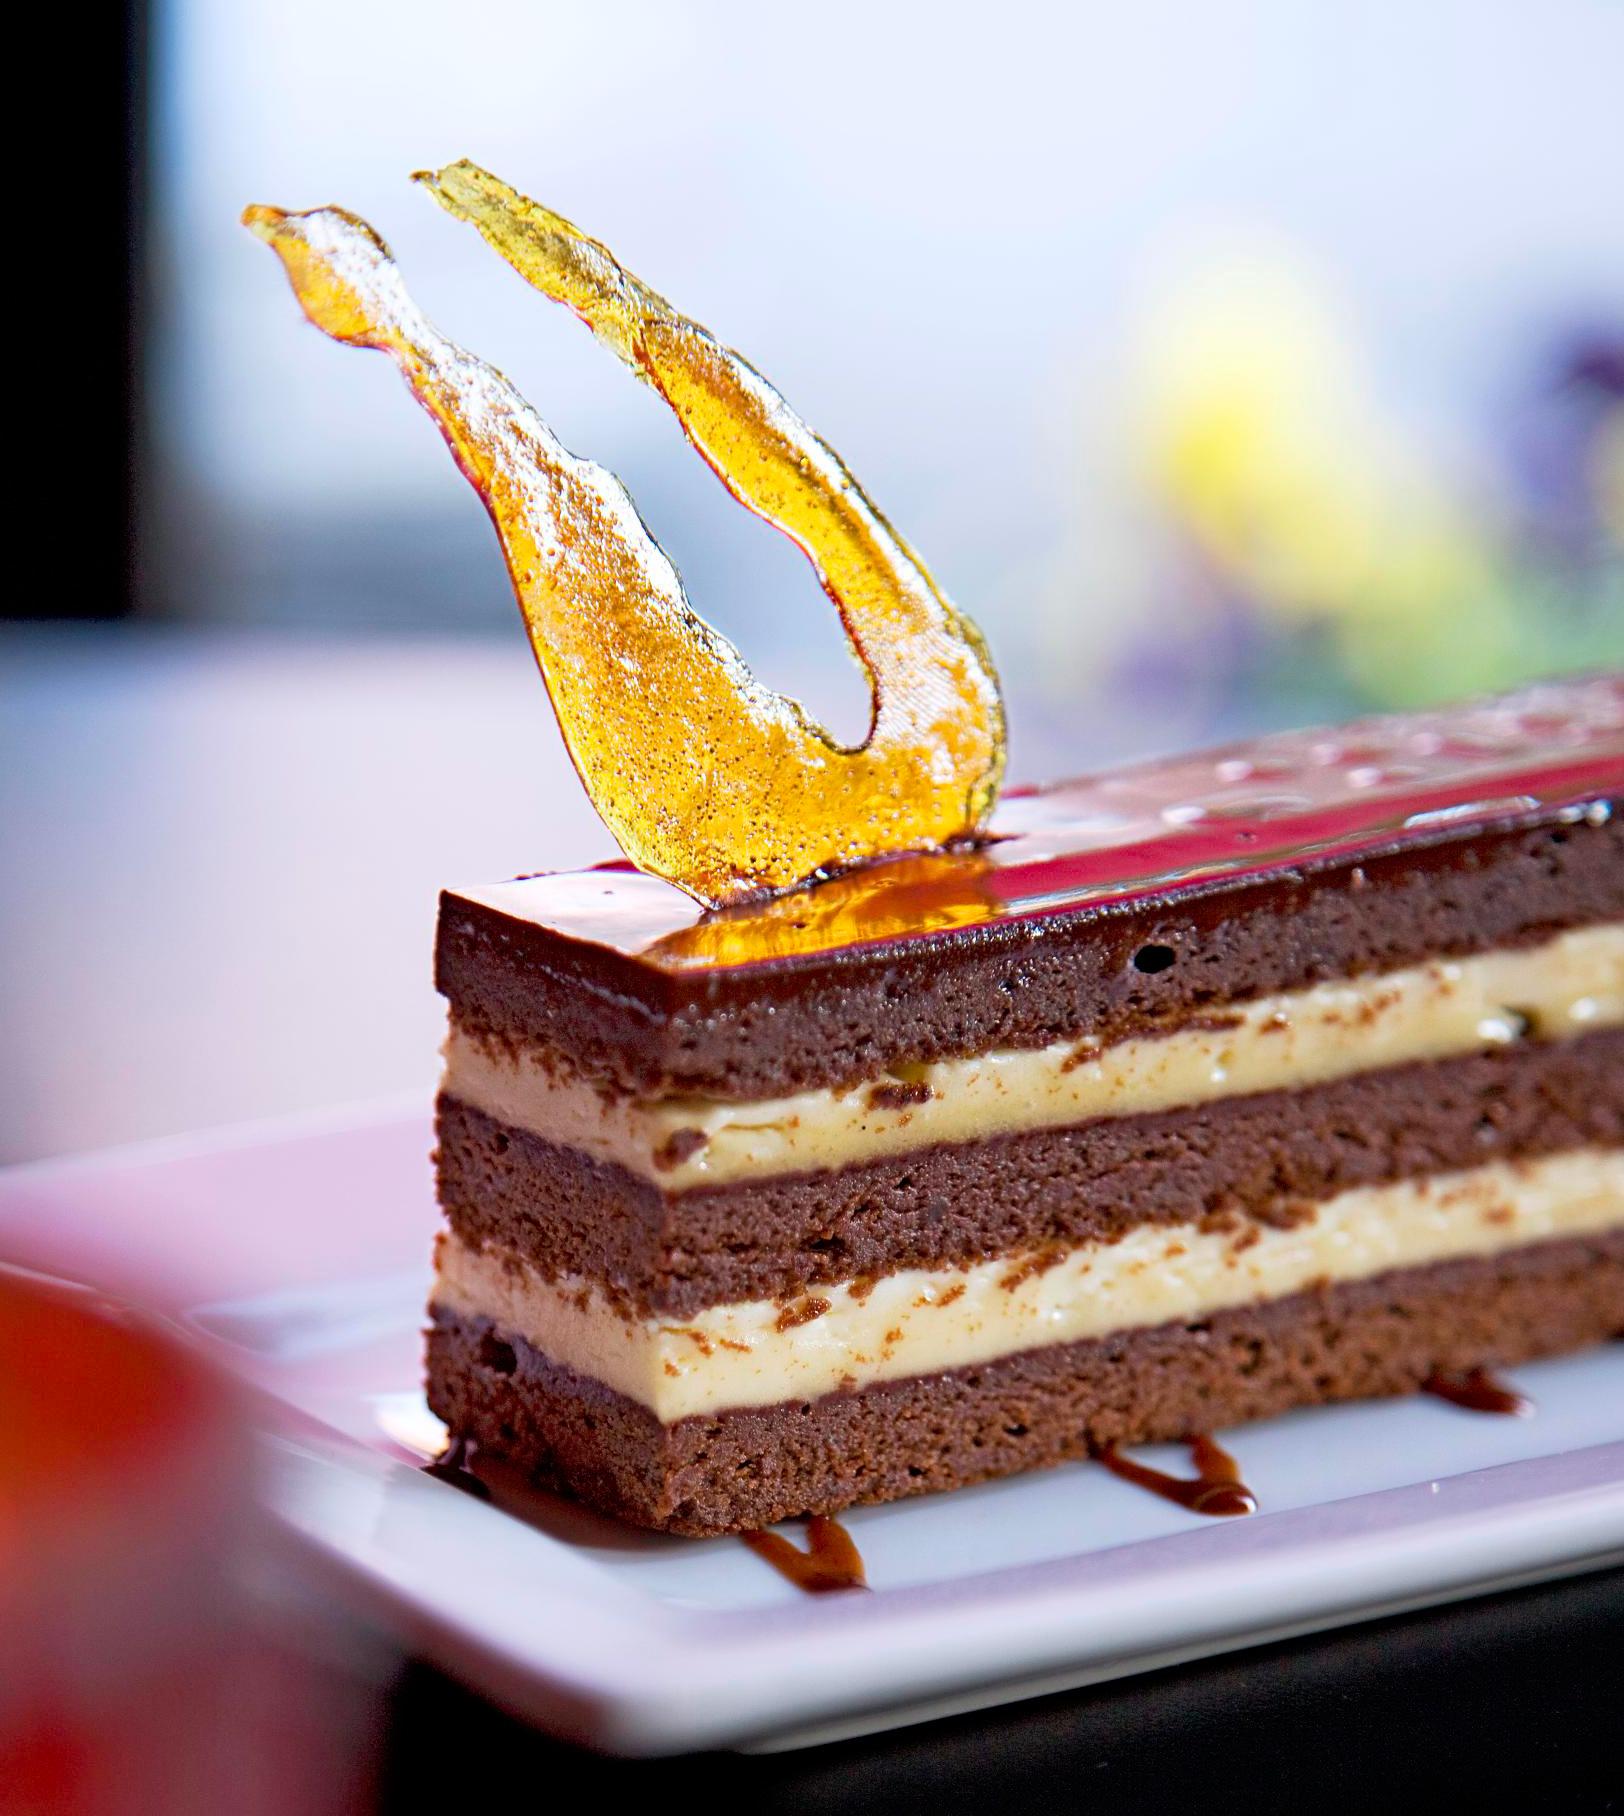 The namesake dessert at Baileys' Chocolate Bar layers cake and boozy buttercream.